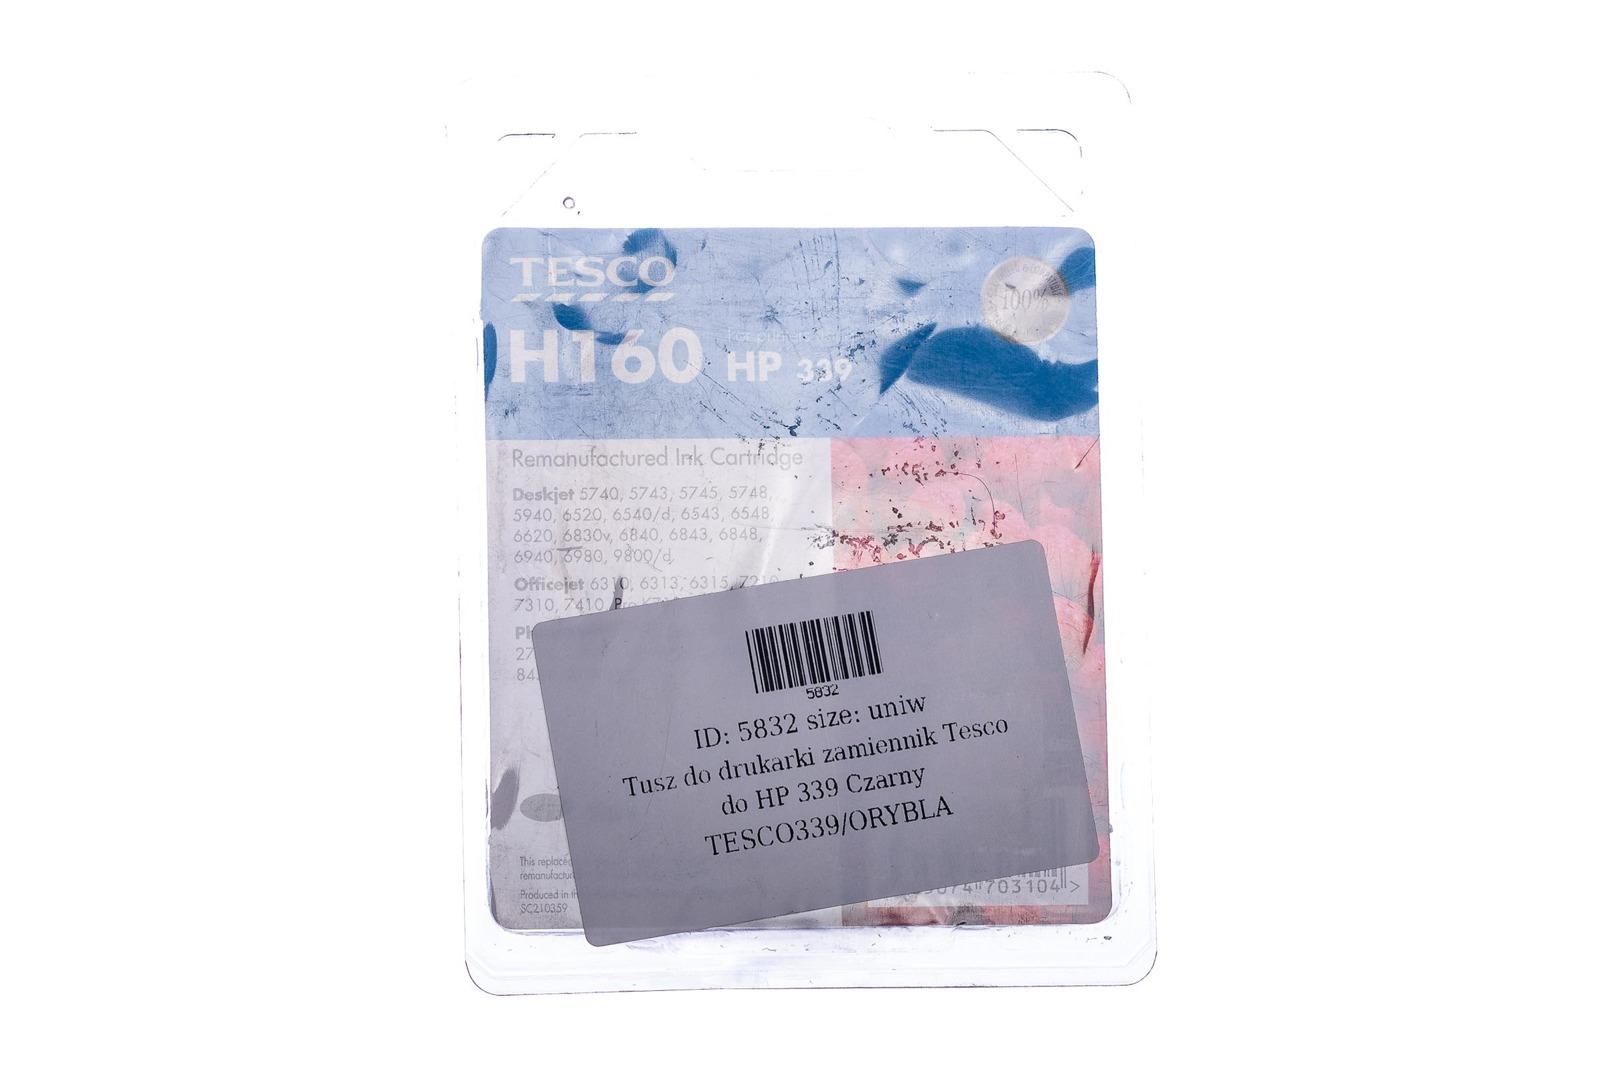 Remanufactured Ink cartridge Tesco HP 339 Black